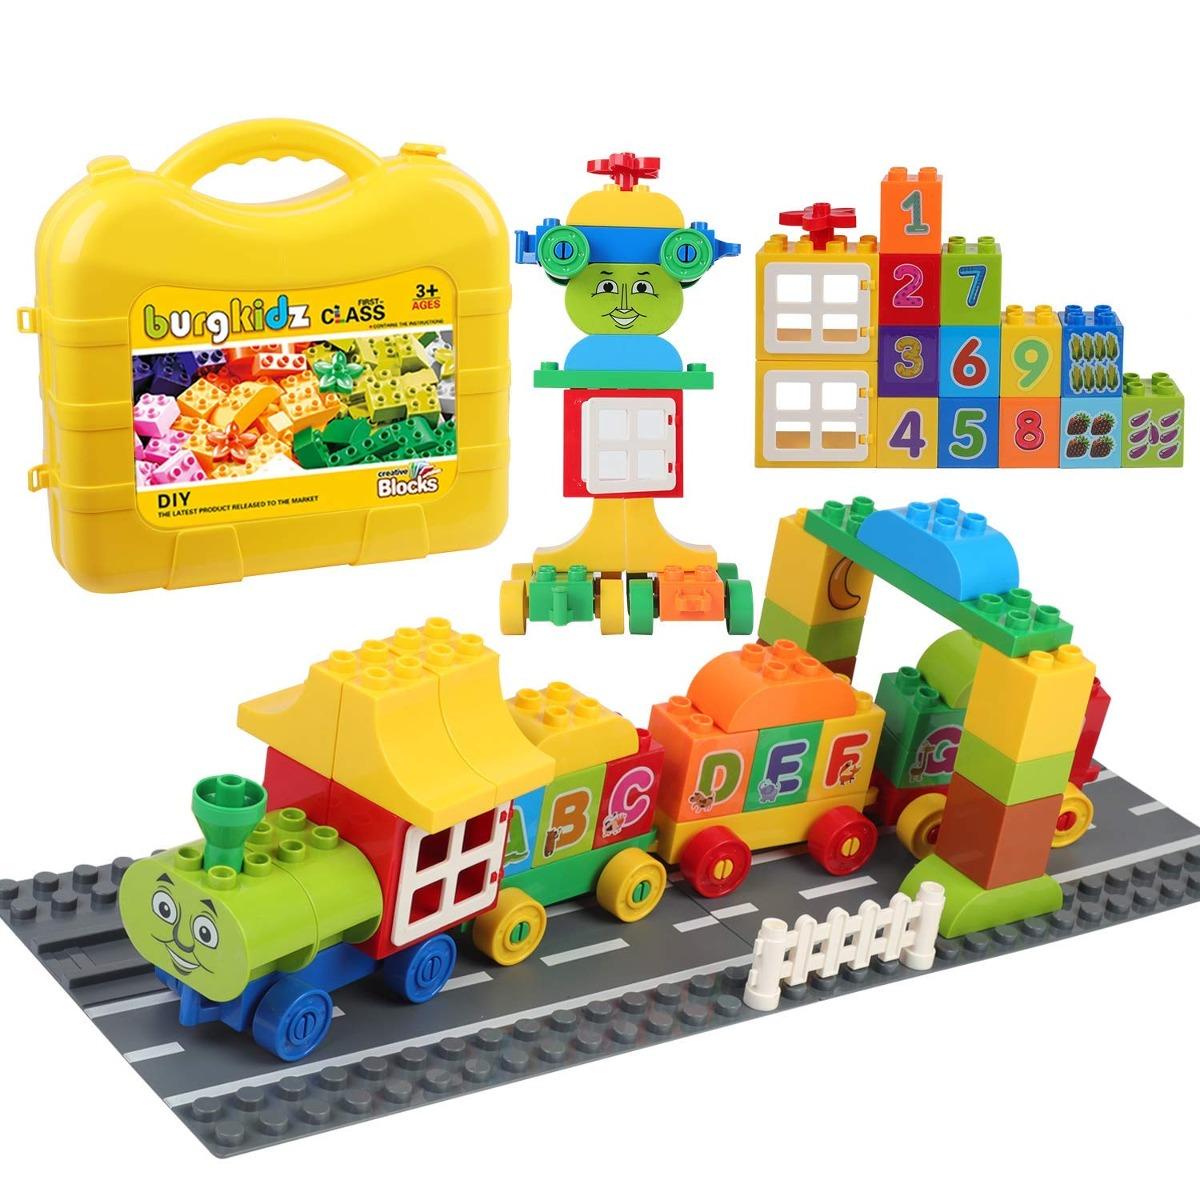 Maleta Tren De Burgkidz Para Niños Aprendizaje Juguetes 6 W9H2IDE